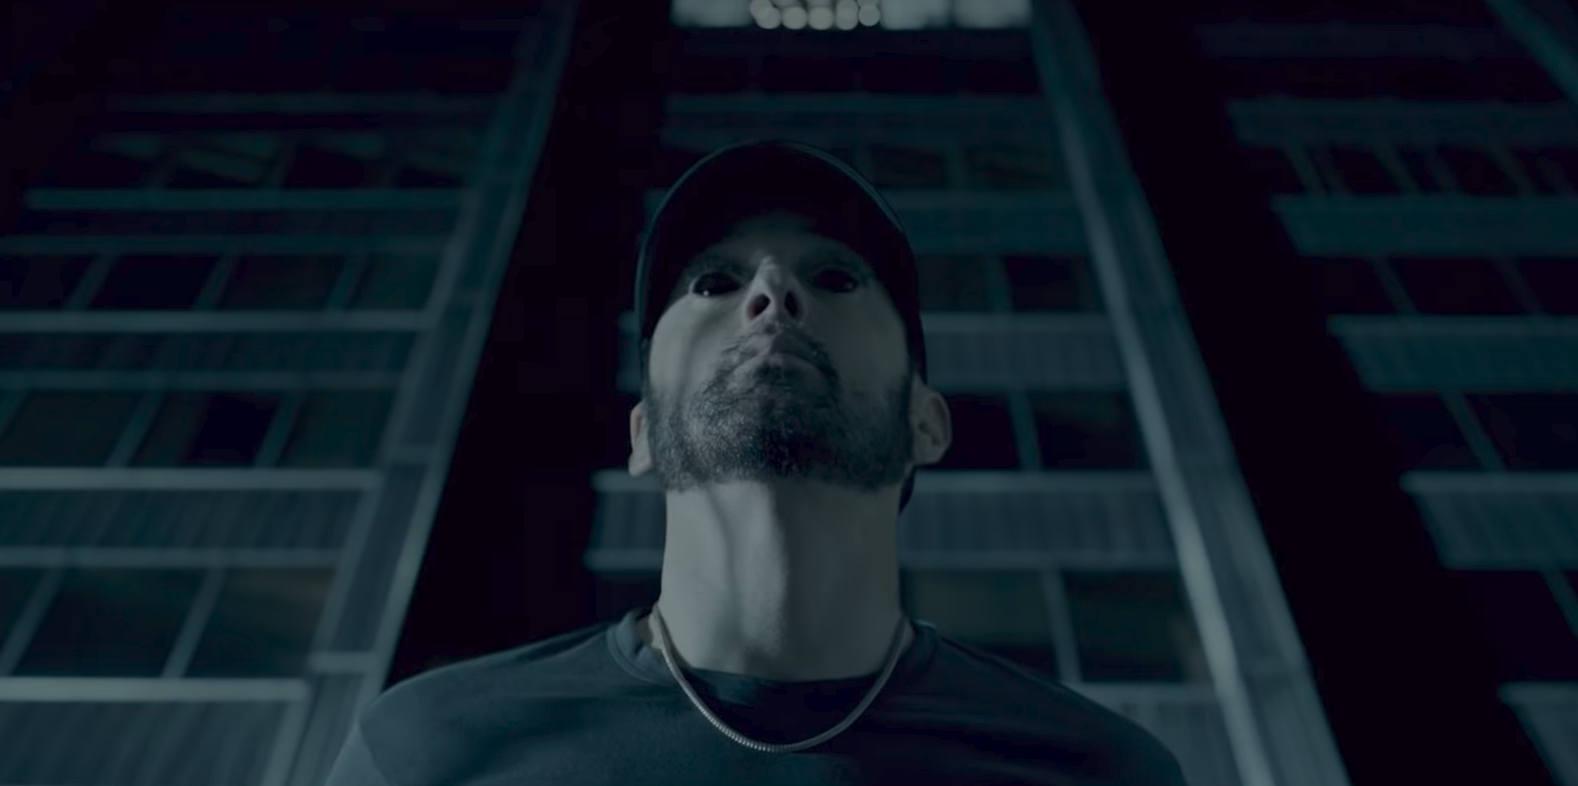 Авторский перевод «Eminem.Pro» текста нового трека Eminem'а — «Fall» на русский язык